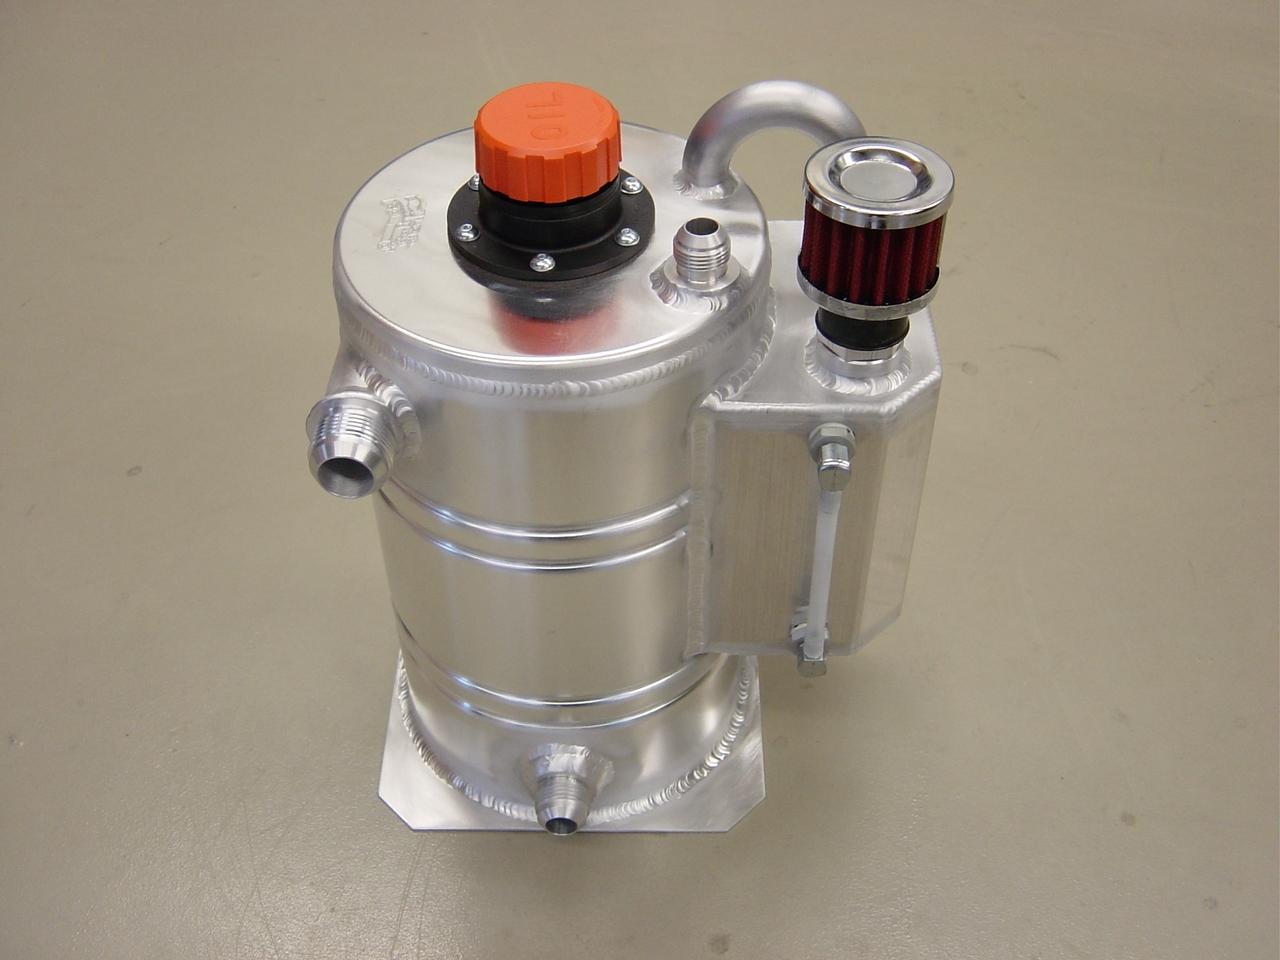 Dry-sump tank 8 liter speciaal - L - Dash 12-0